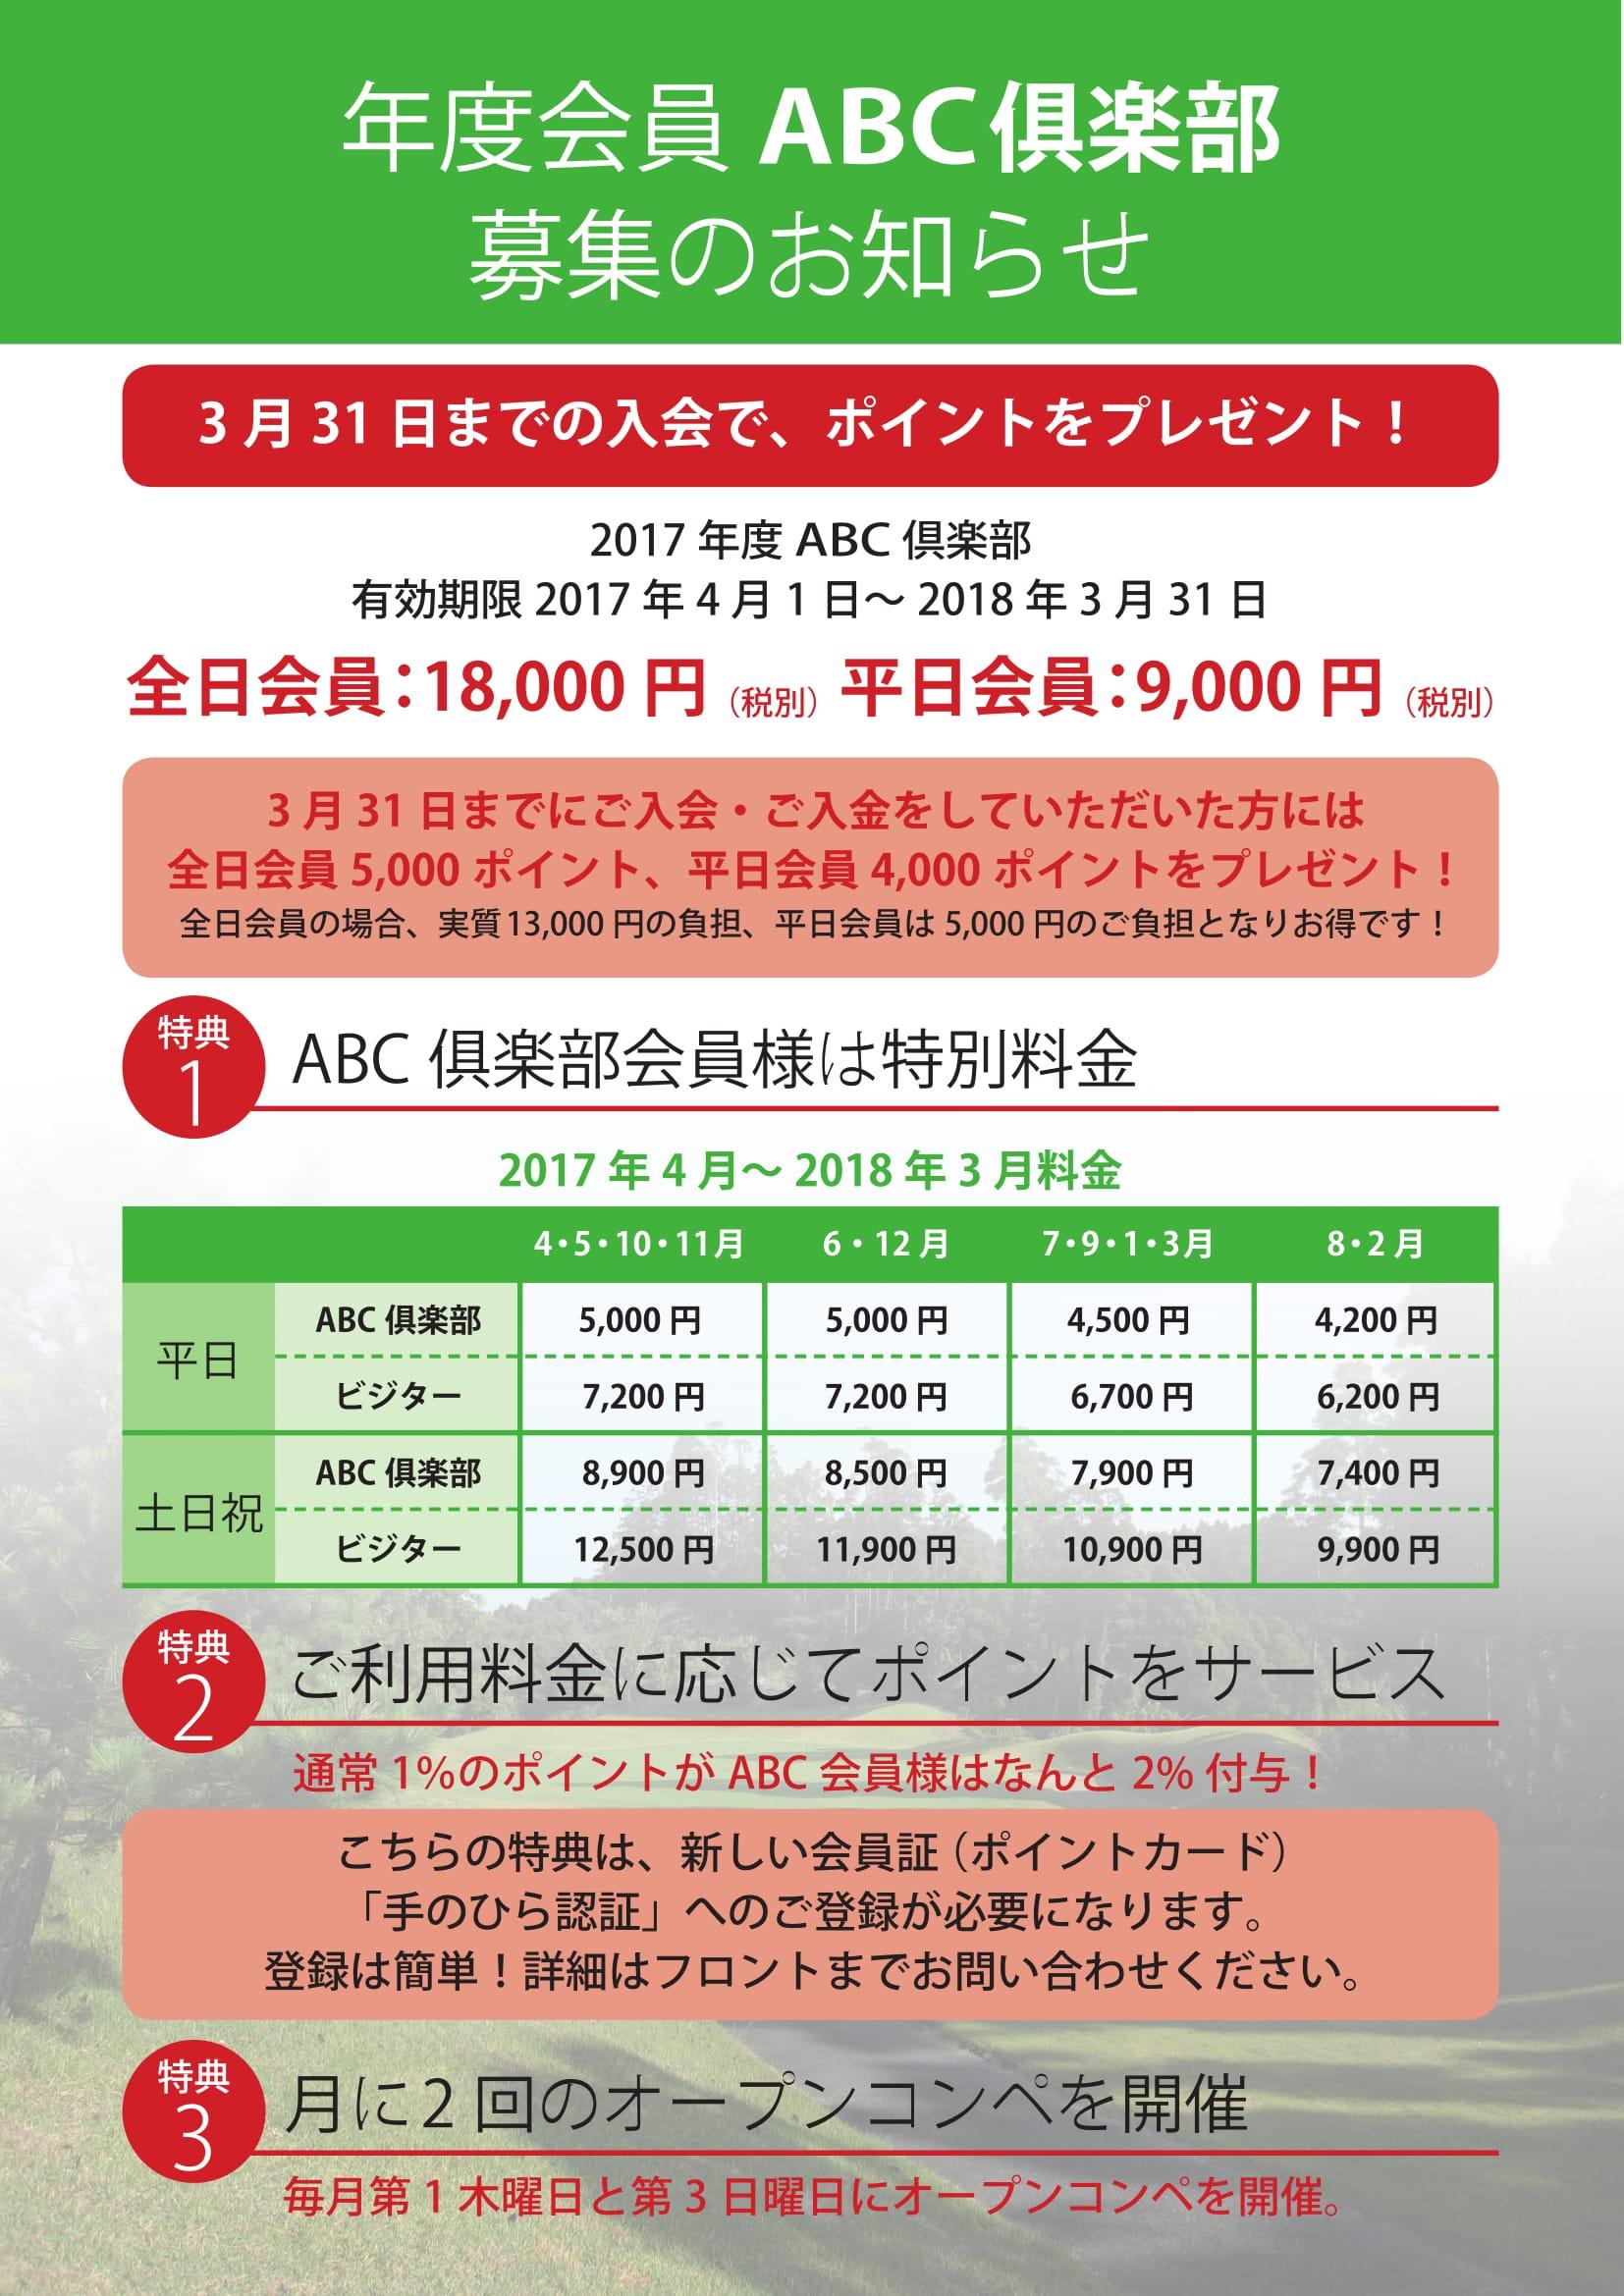 ABC倶楽部(友の会)入会キャンペーン